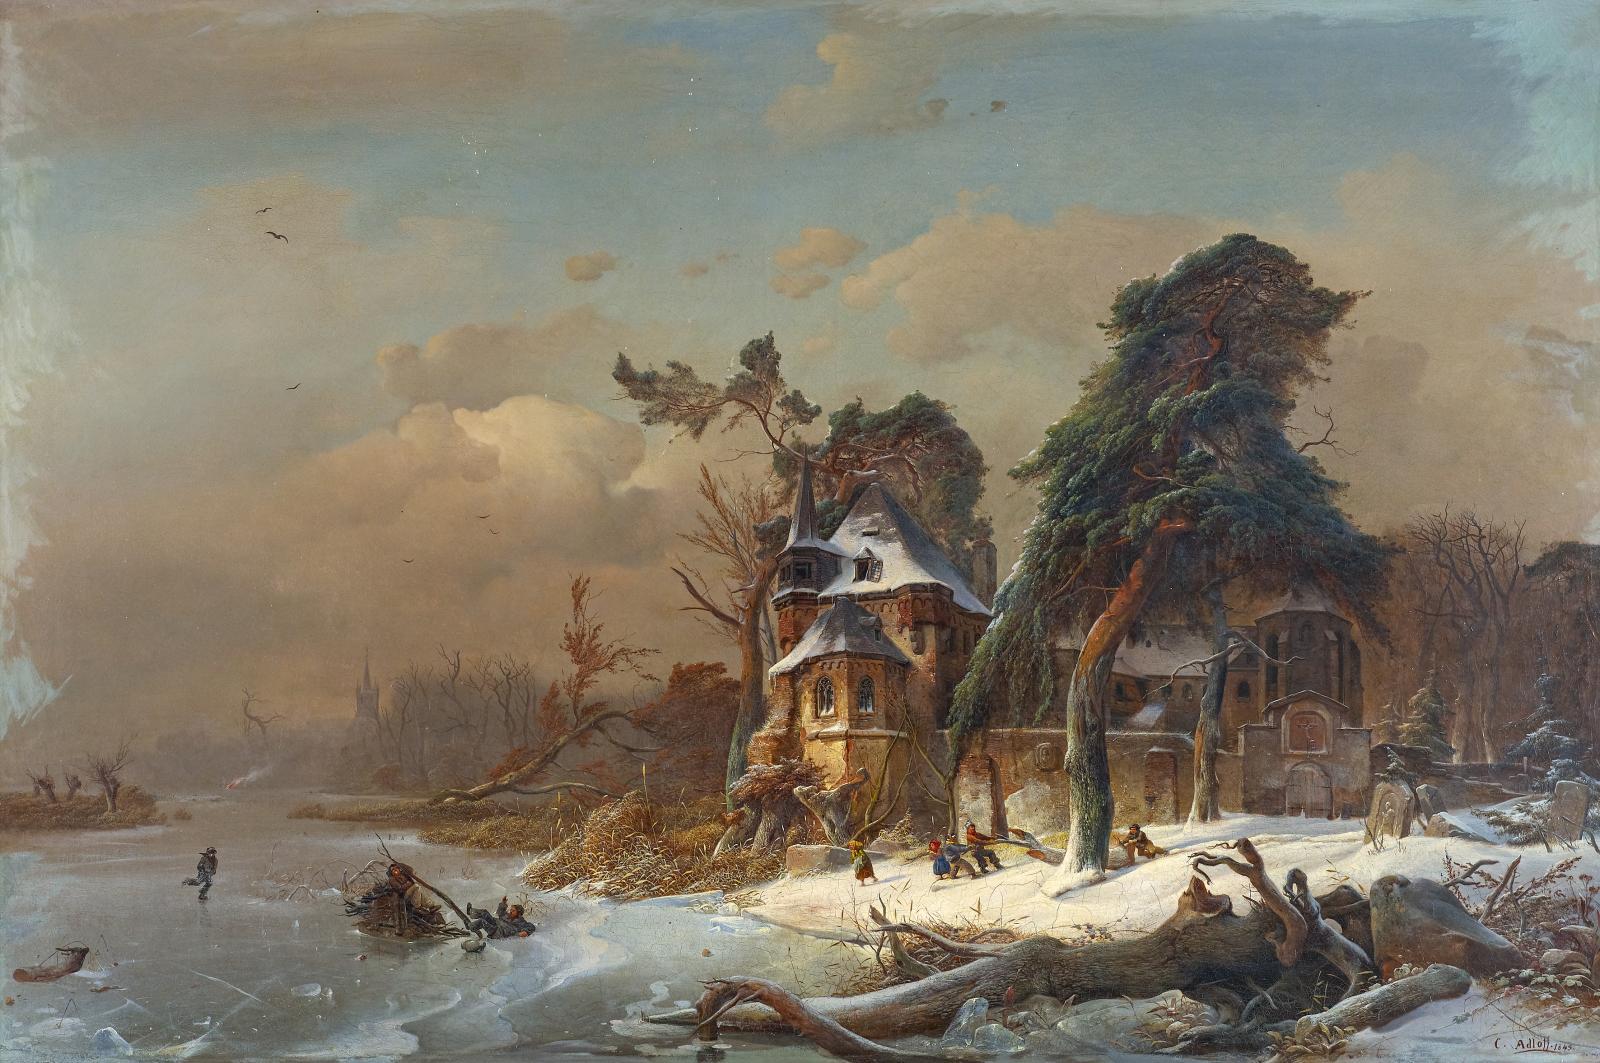 Carl Adloff - Wintery Ruin of a Monastery, 1893